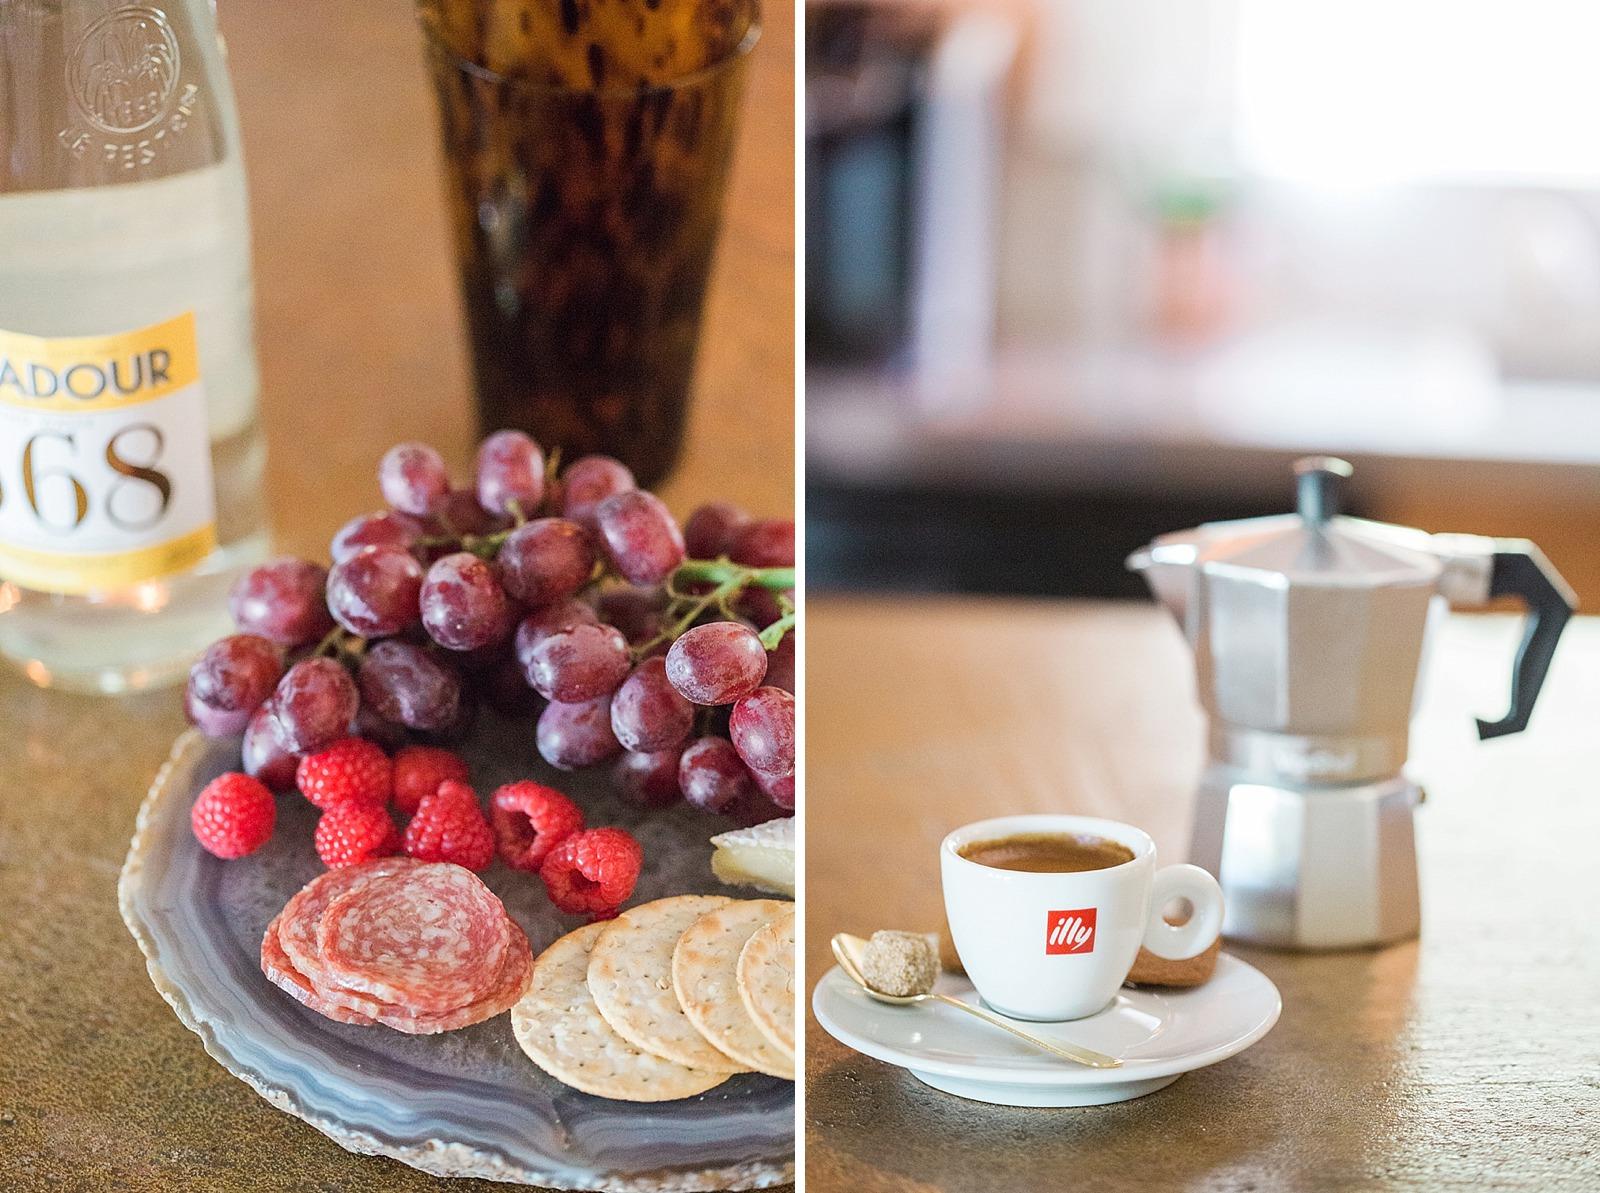 kitchen-diana-elizabeth-photography-blog-walker-zanger-cocoon-6th-avenue-mosaic-tile-white-tile-backsplash-9586